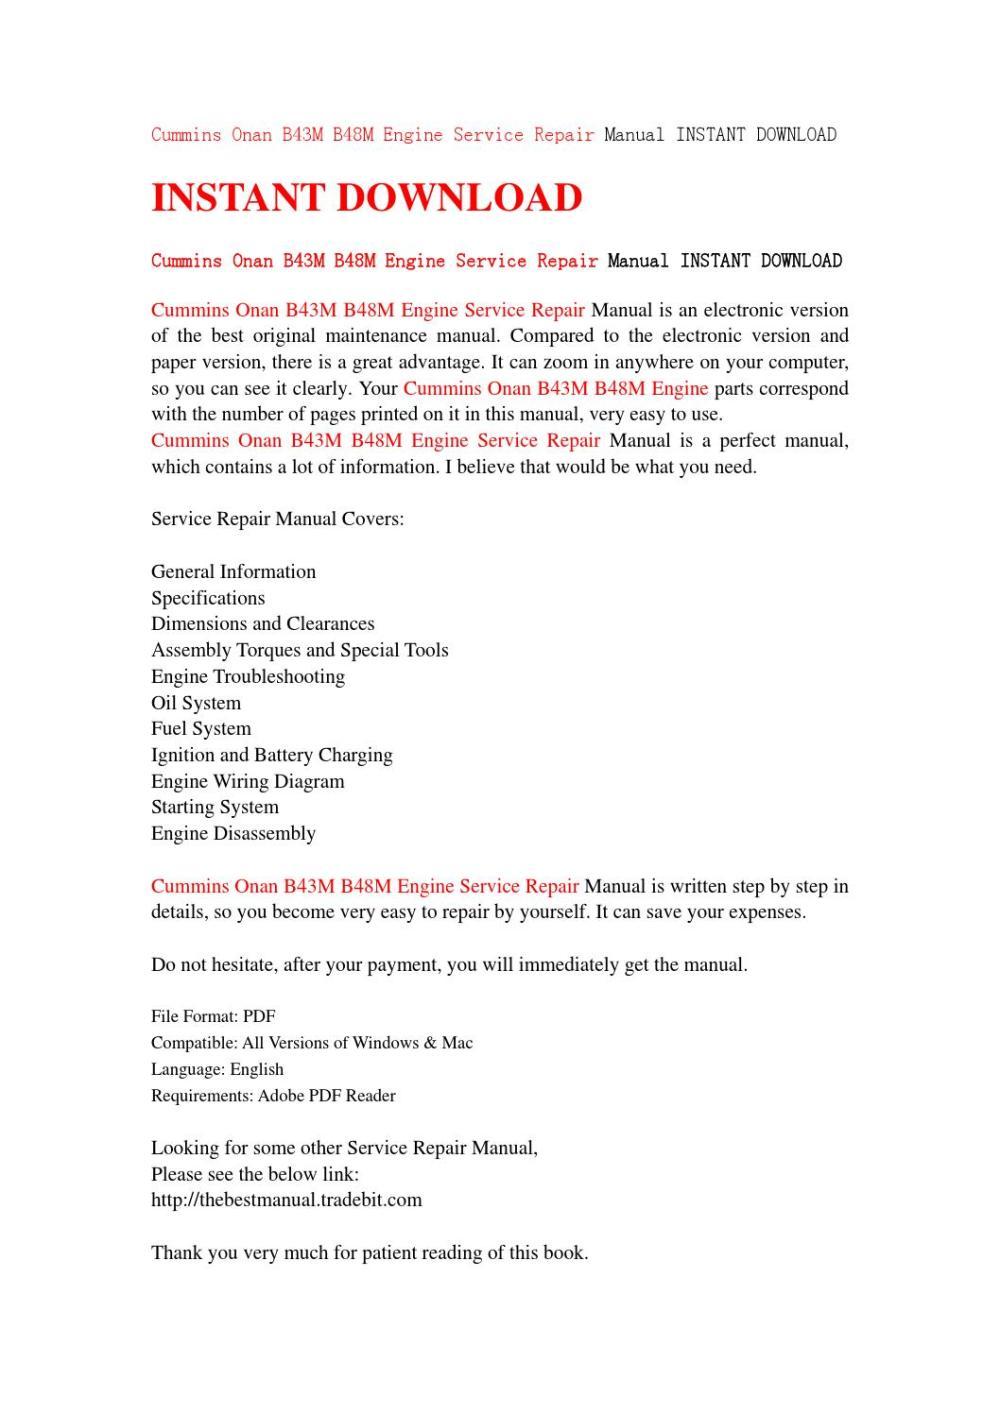 medium resolution of cummins onan b43m b48m engine service repair manual instant download by jhejfnshef issuu